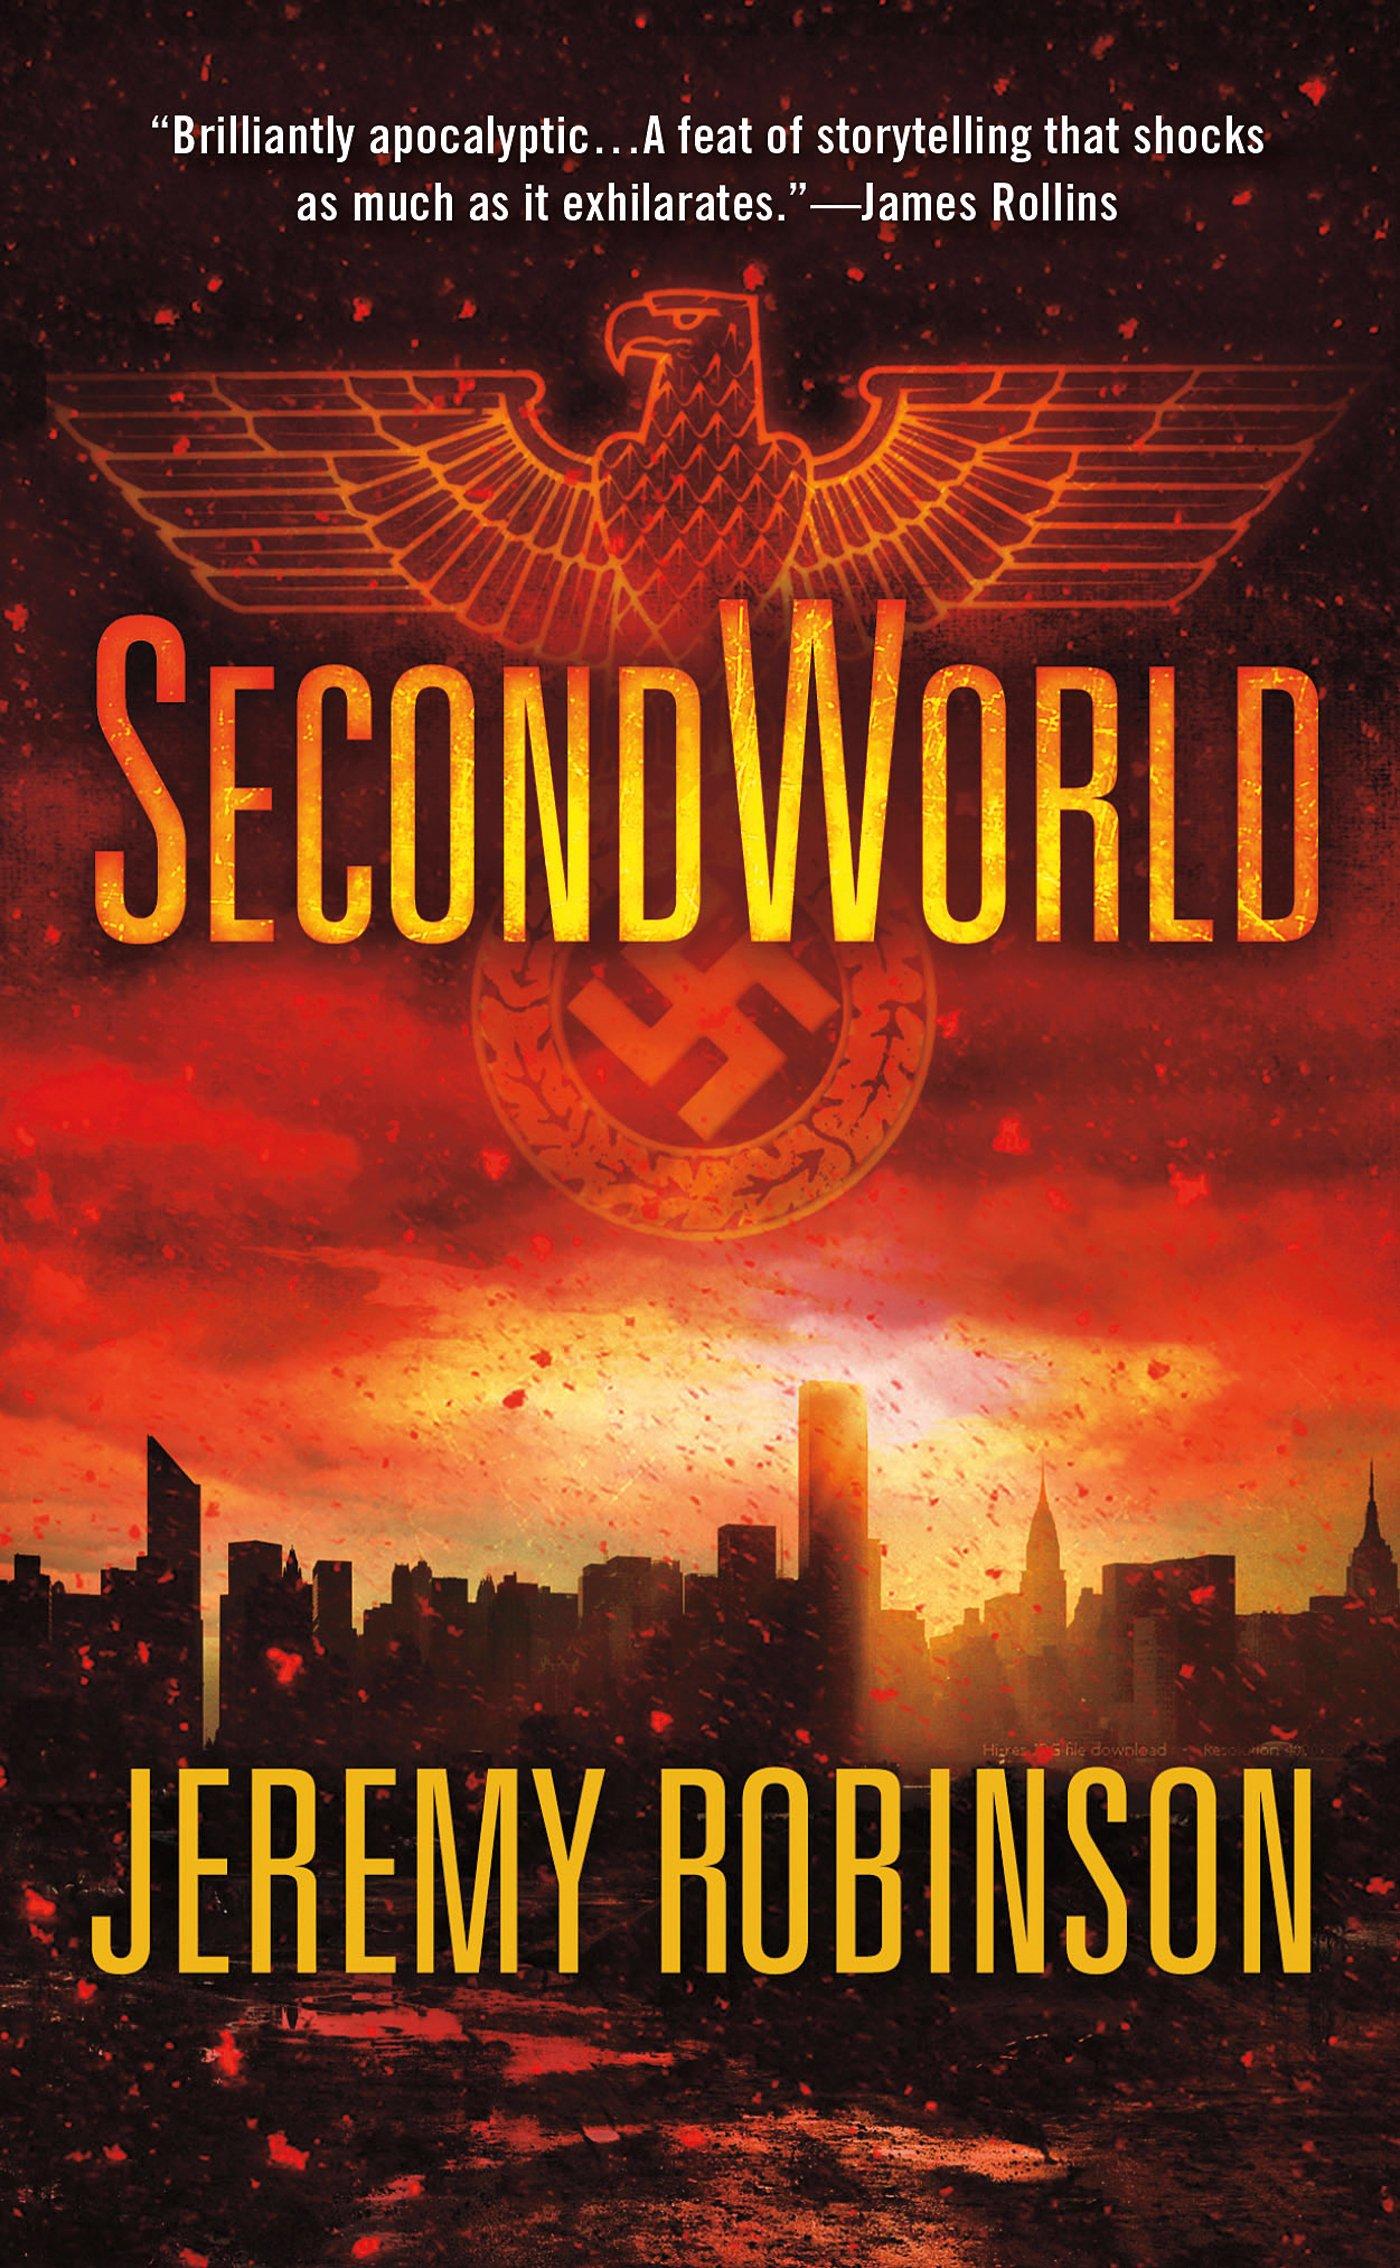 Jeremy Robinson SecondWorld